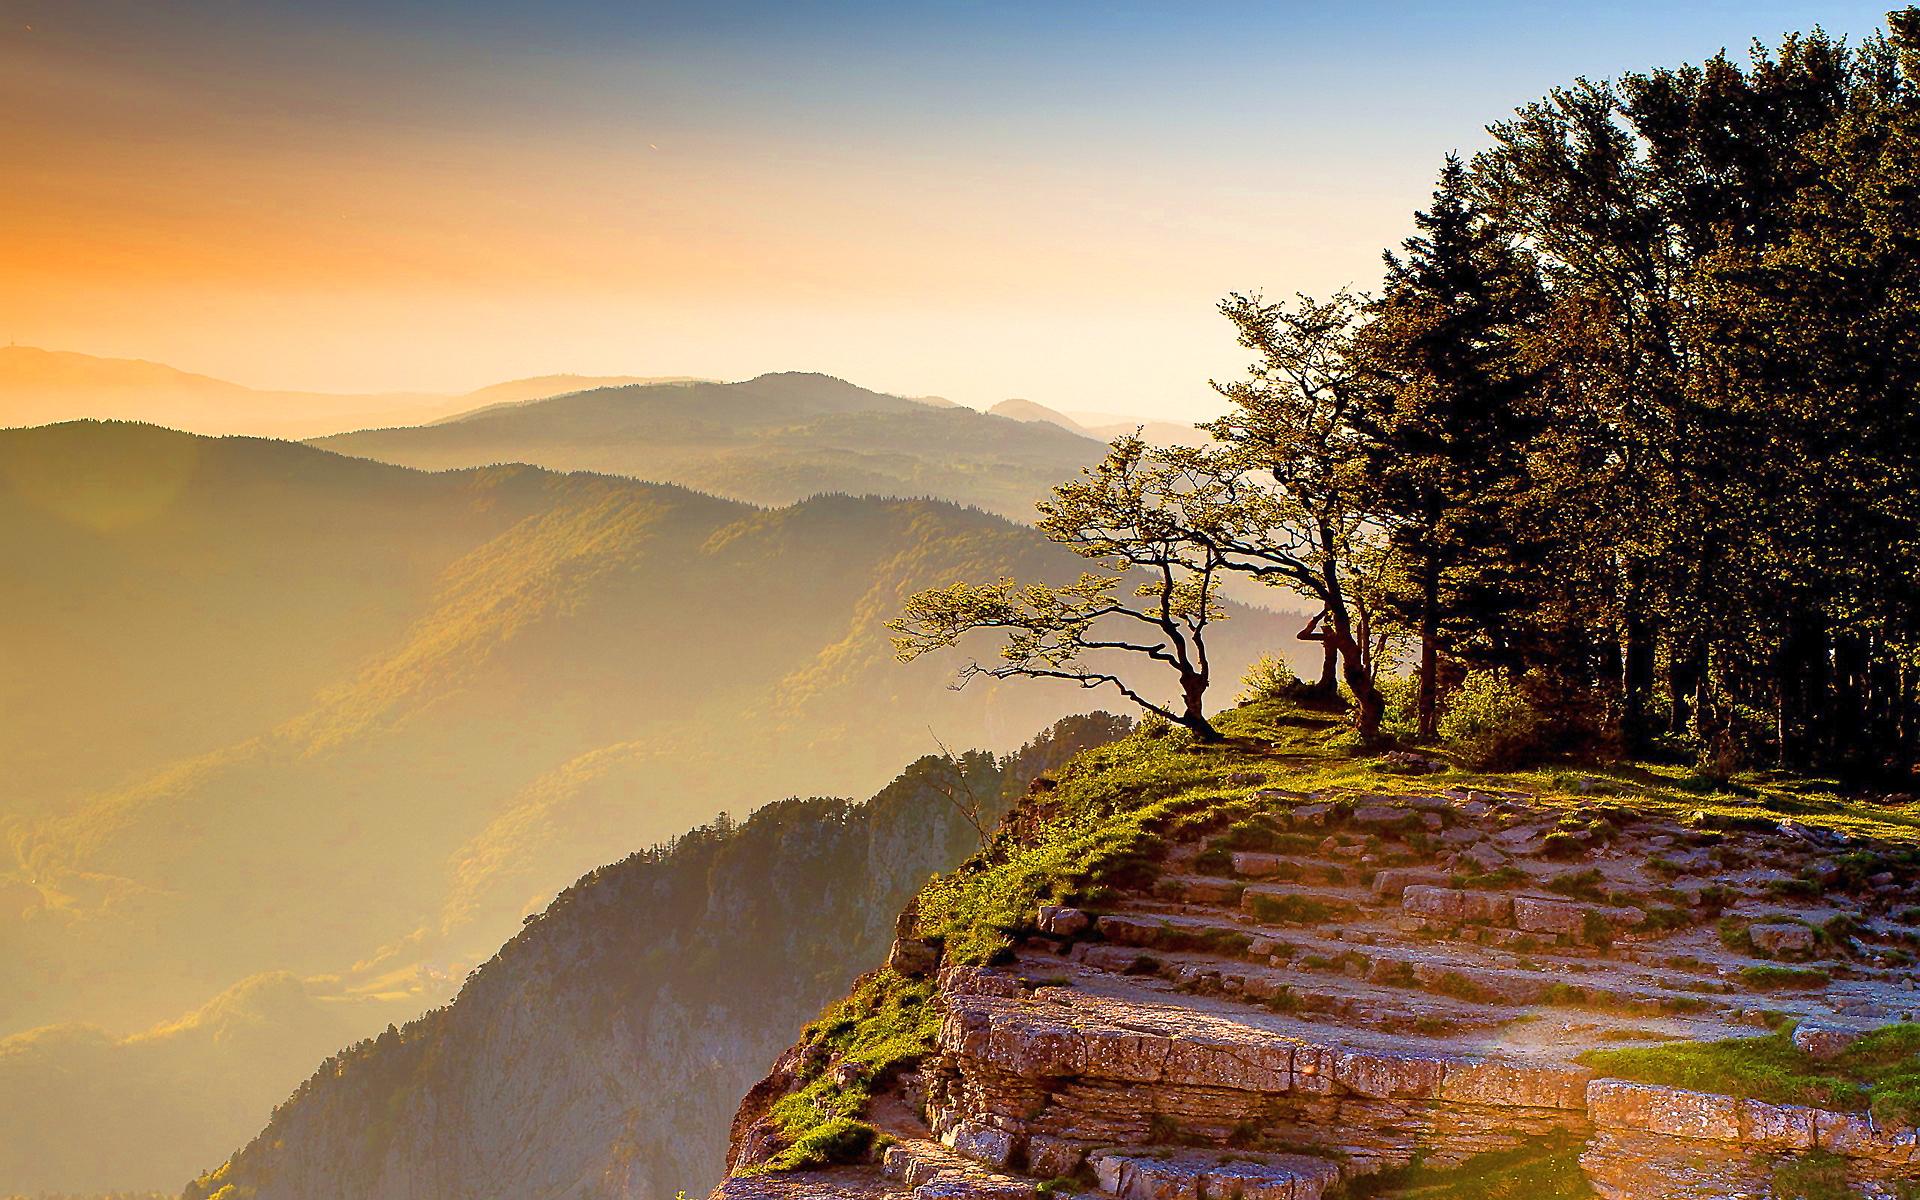 sunset images mountain - HD Desktop Wallpapers | 4k HD